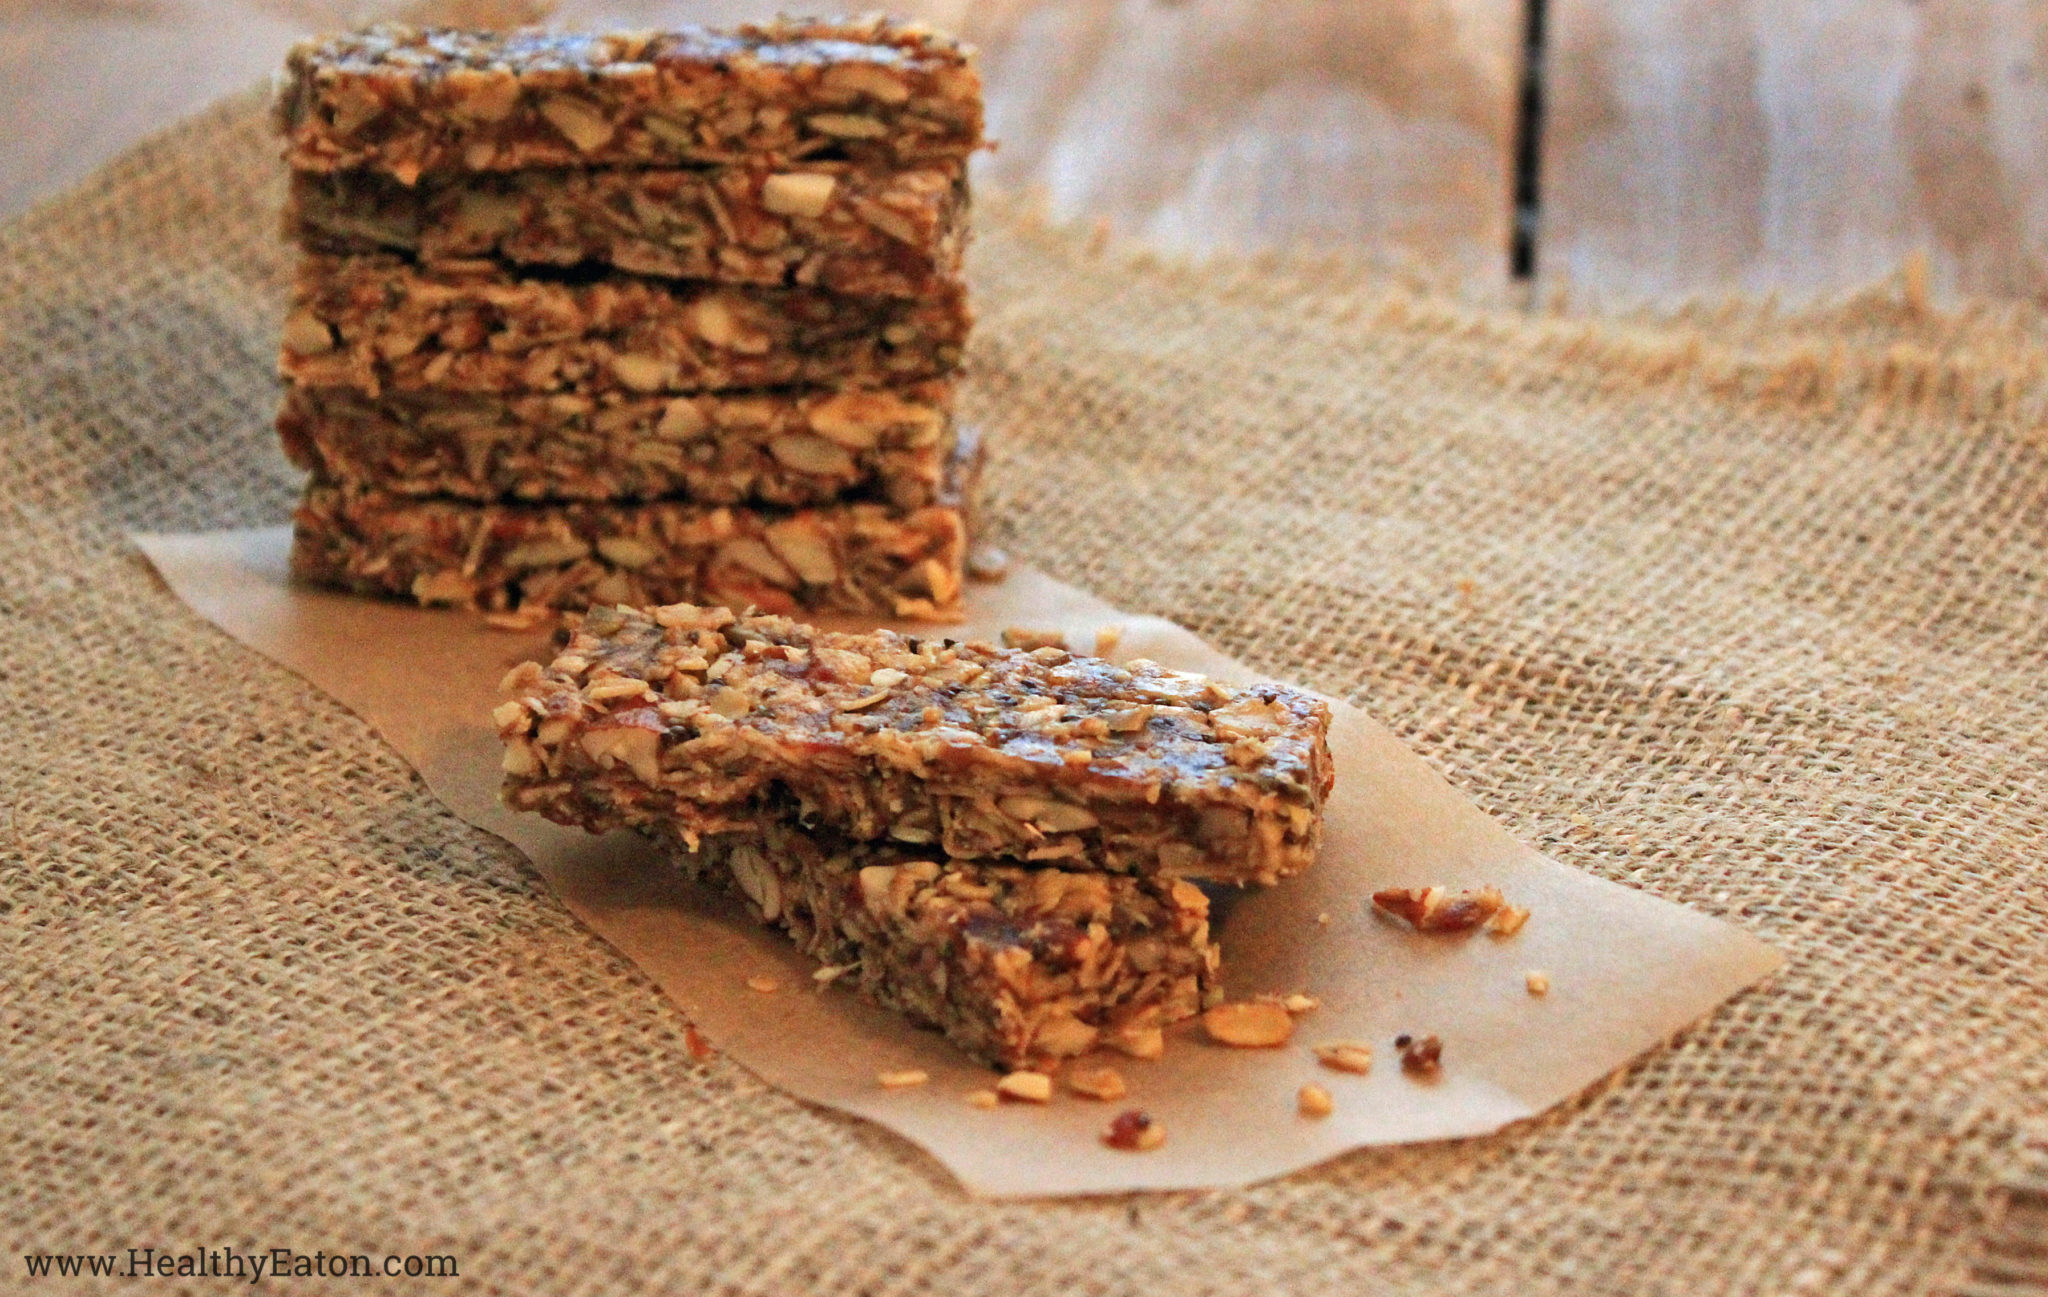 RECIPE: Superfood Granola Bars